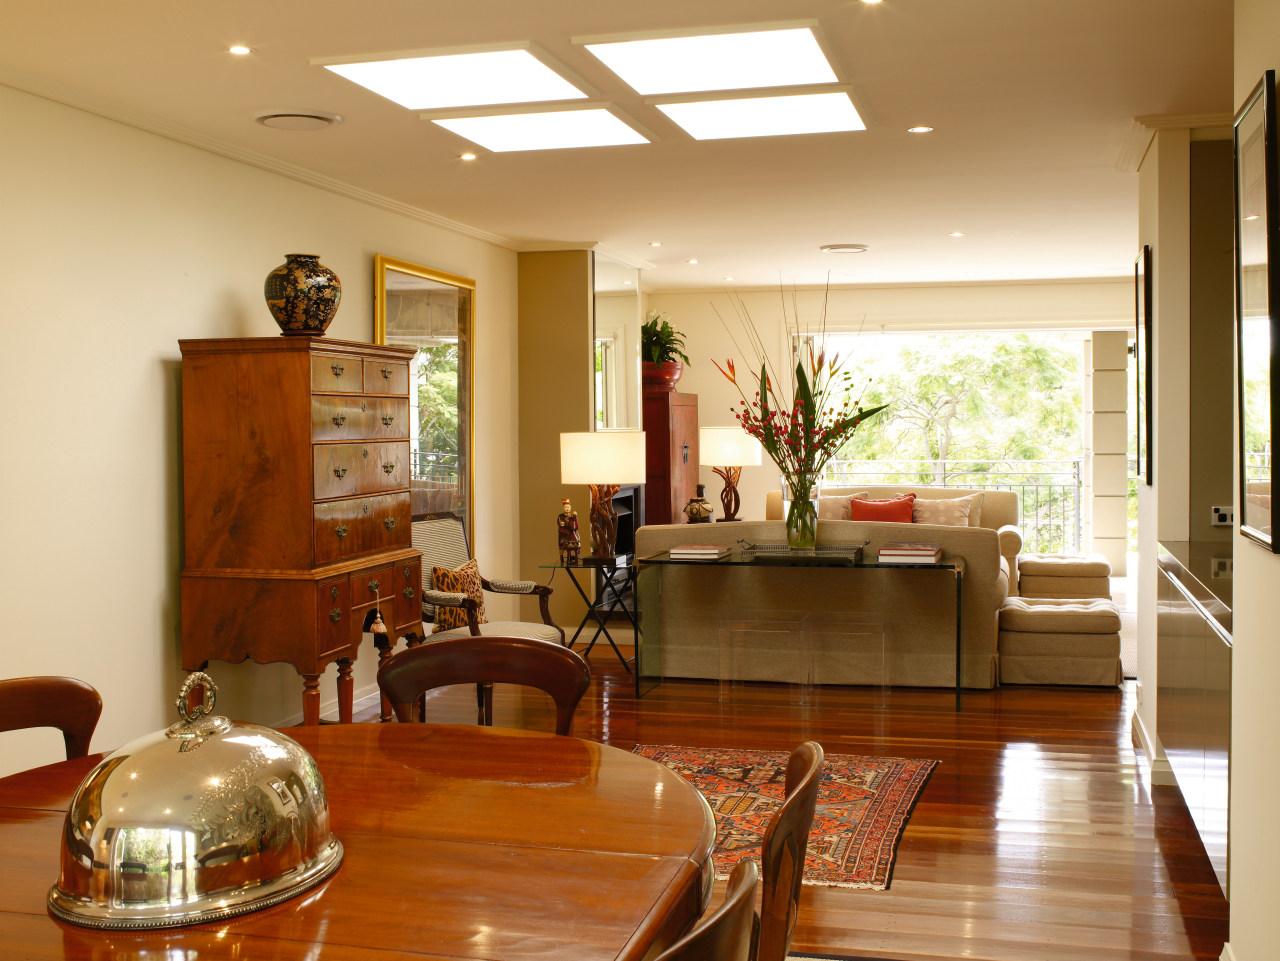 Diners can look out across the living area ceiling, dining room, floor, flooring, hardwood, home, interior design, living room, real estate, room, window, wood, wood flooring, brown, orange